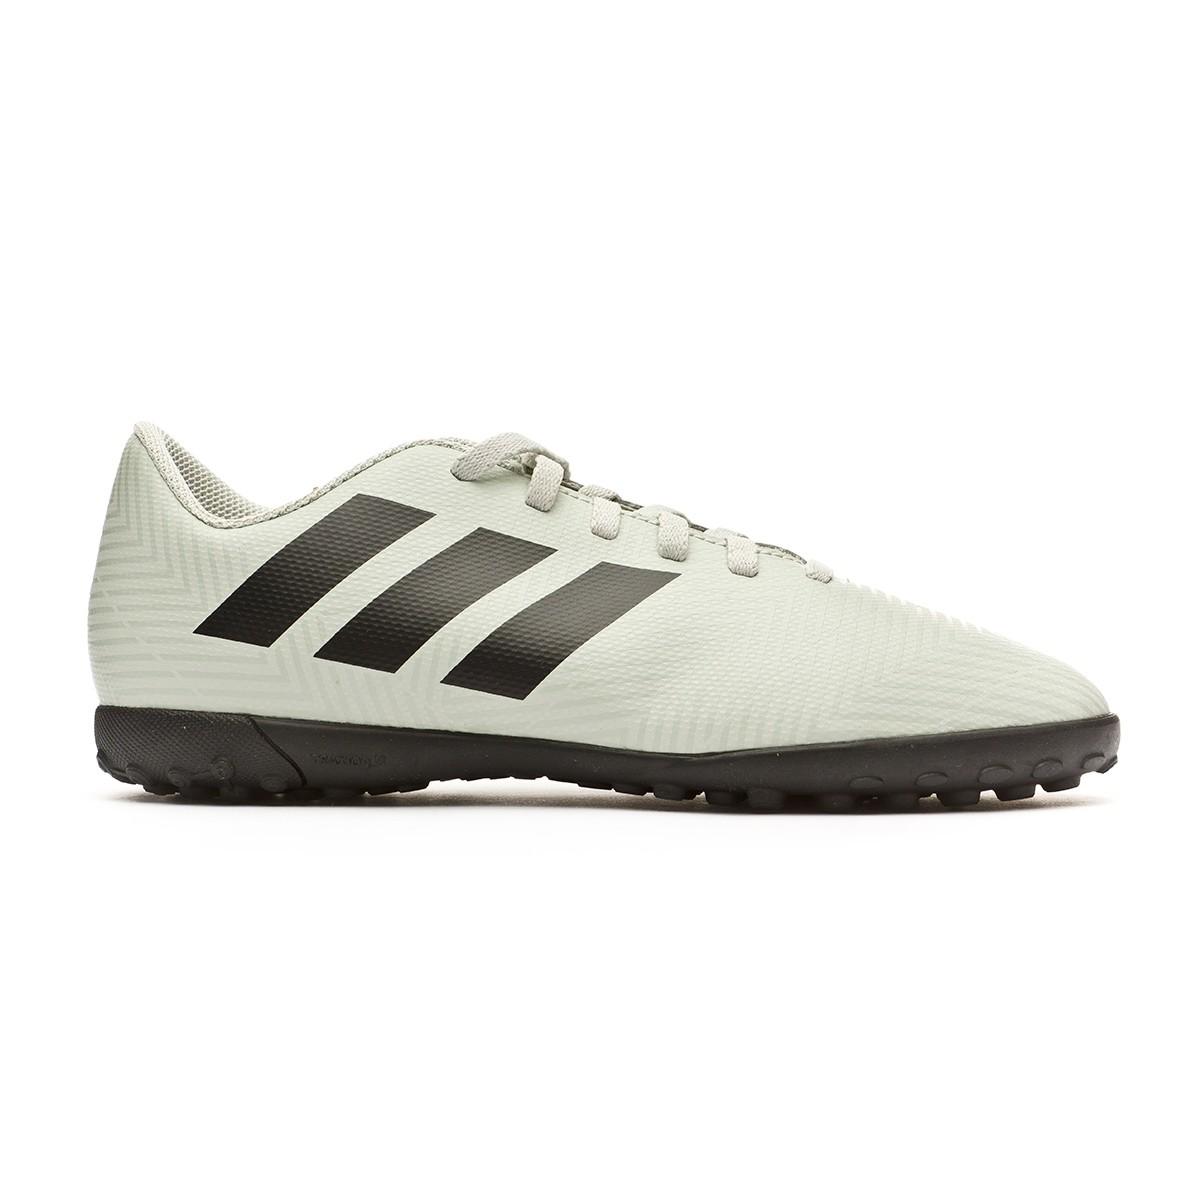 0a5db58b3115f Tenis adidas Nemeziz Tango 18.4 Turf Niño Ash silver-Core black-White tint  - Tienda de fútbol Fútbol Emotion